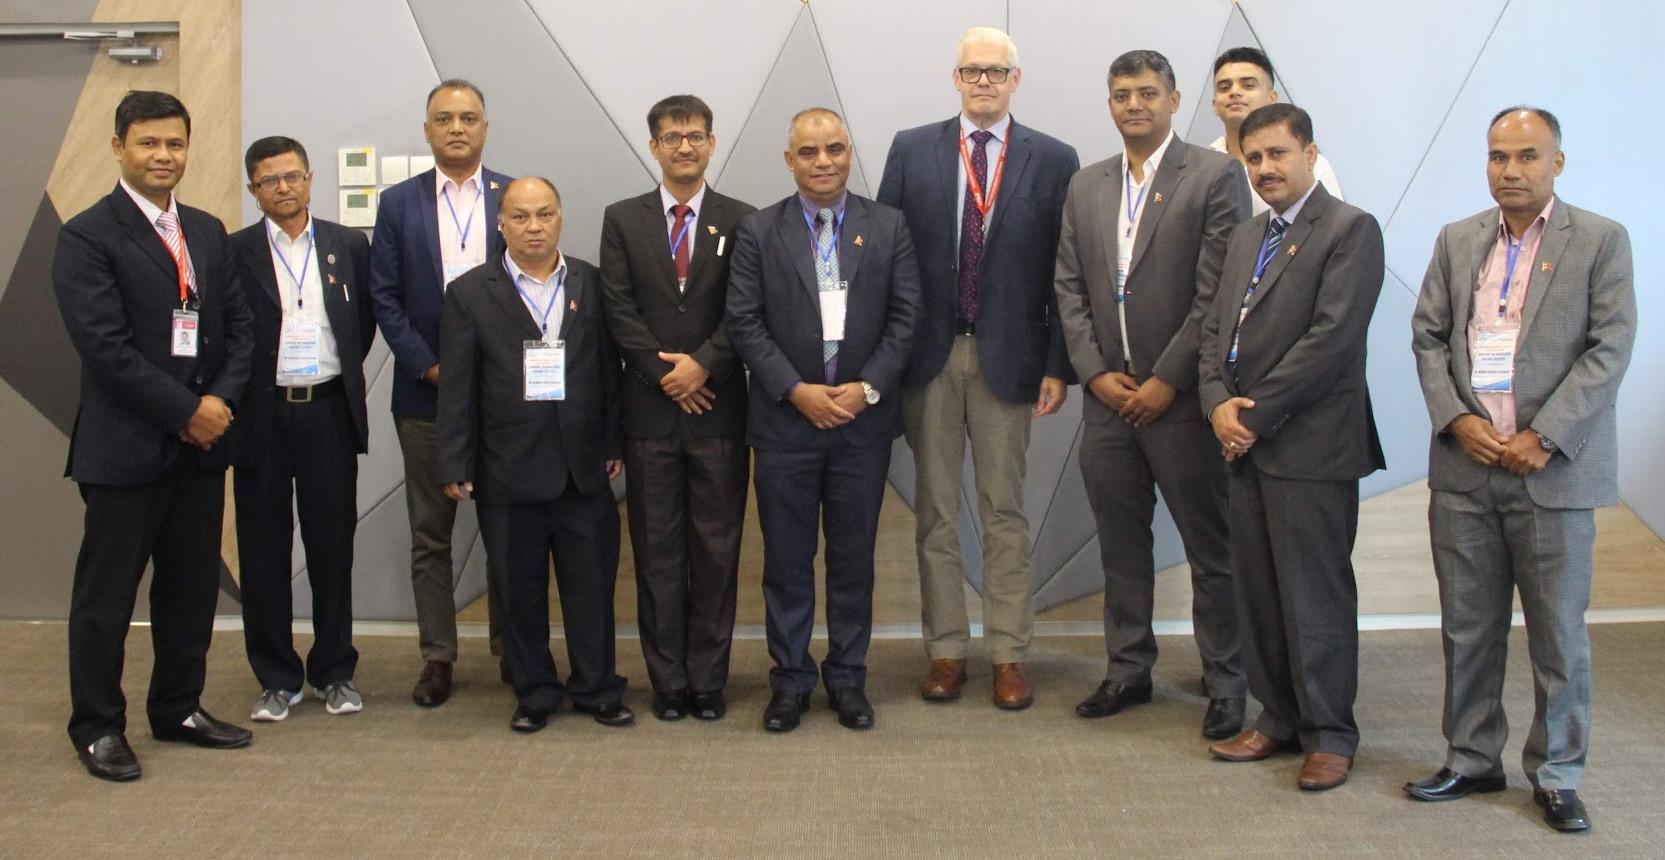 International Training and Study Visit on Leadership and Managementfor Bank Executives 9-11 September 2019, Hanoi, Vietnam